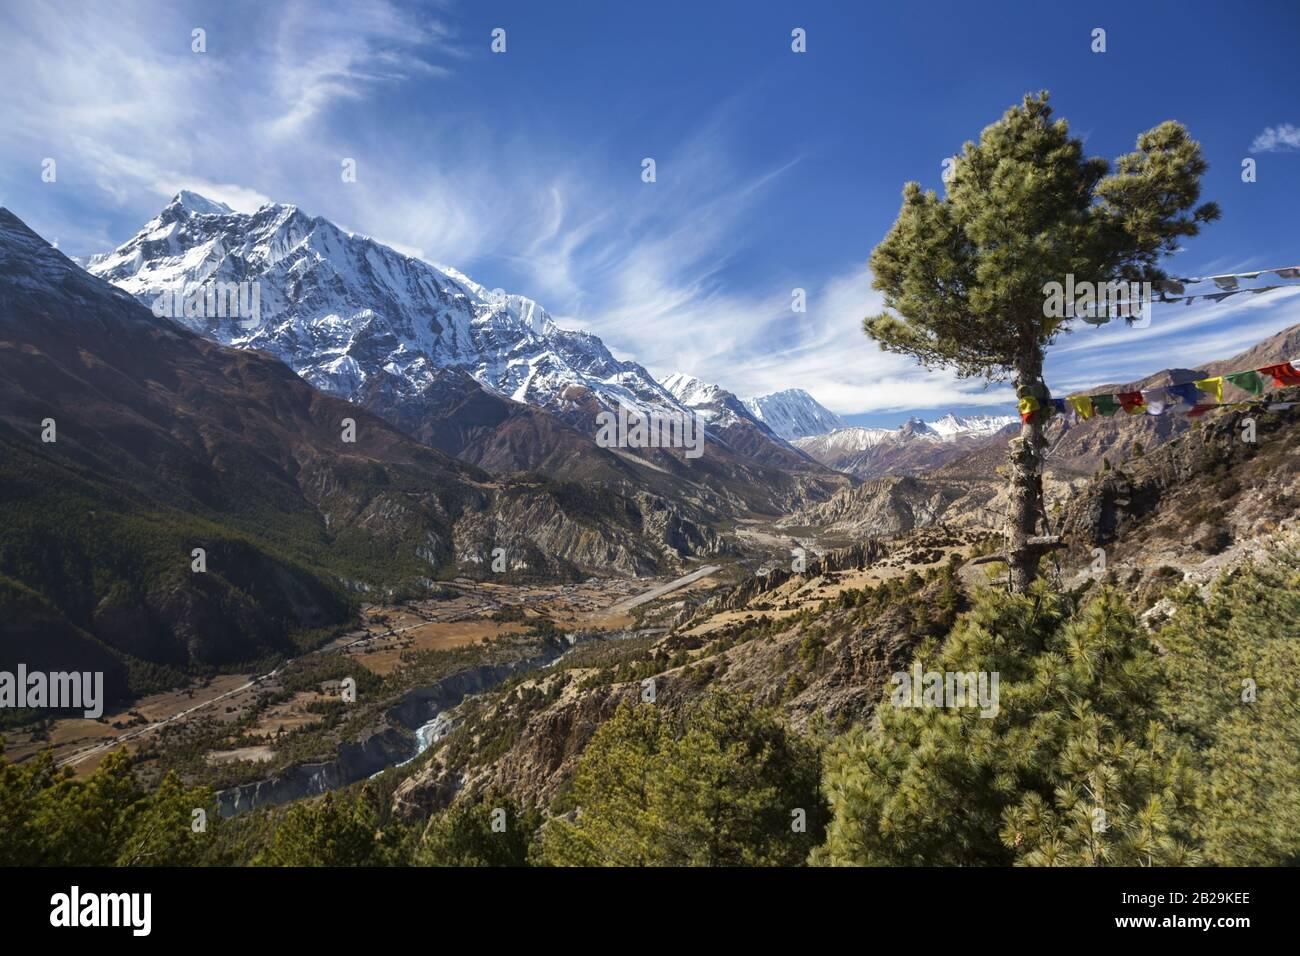 annapurna-mountain-range-landscape-view-